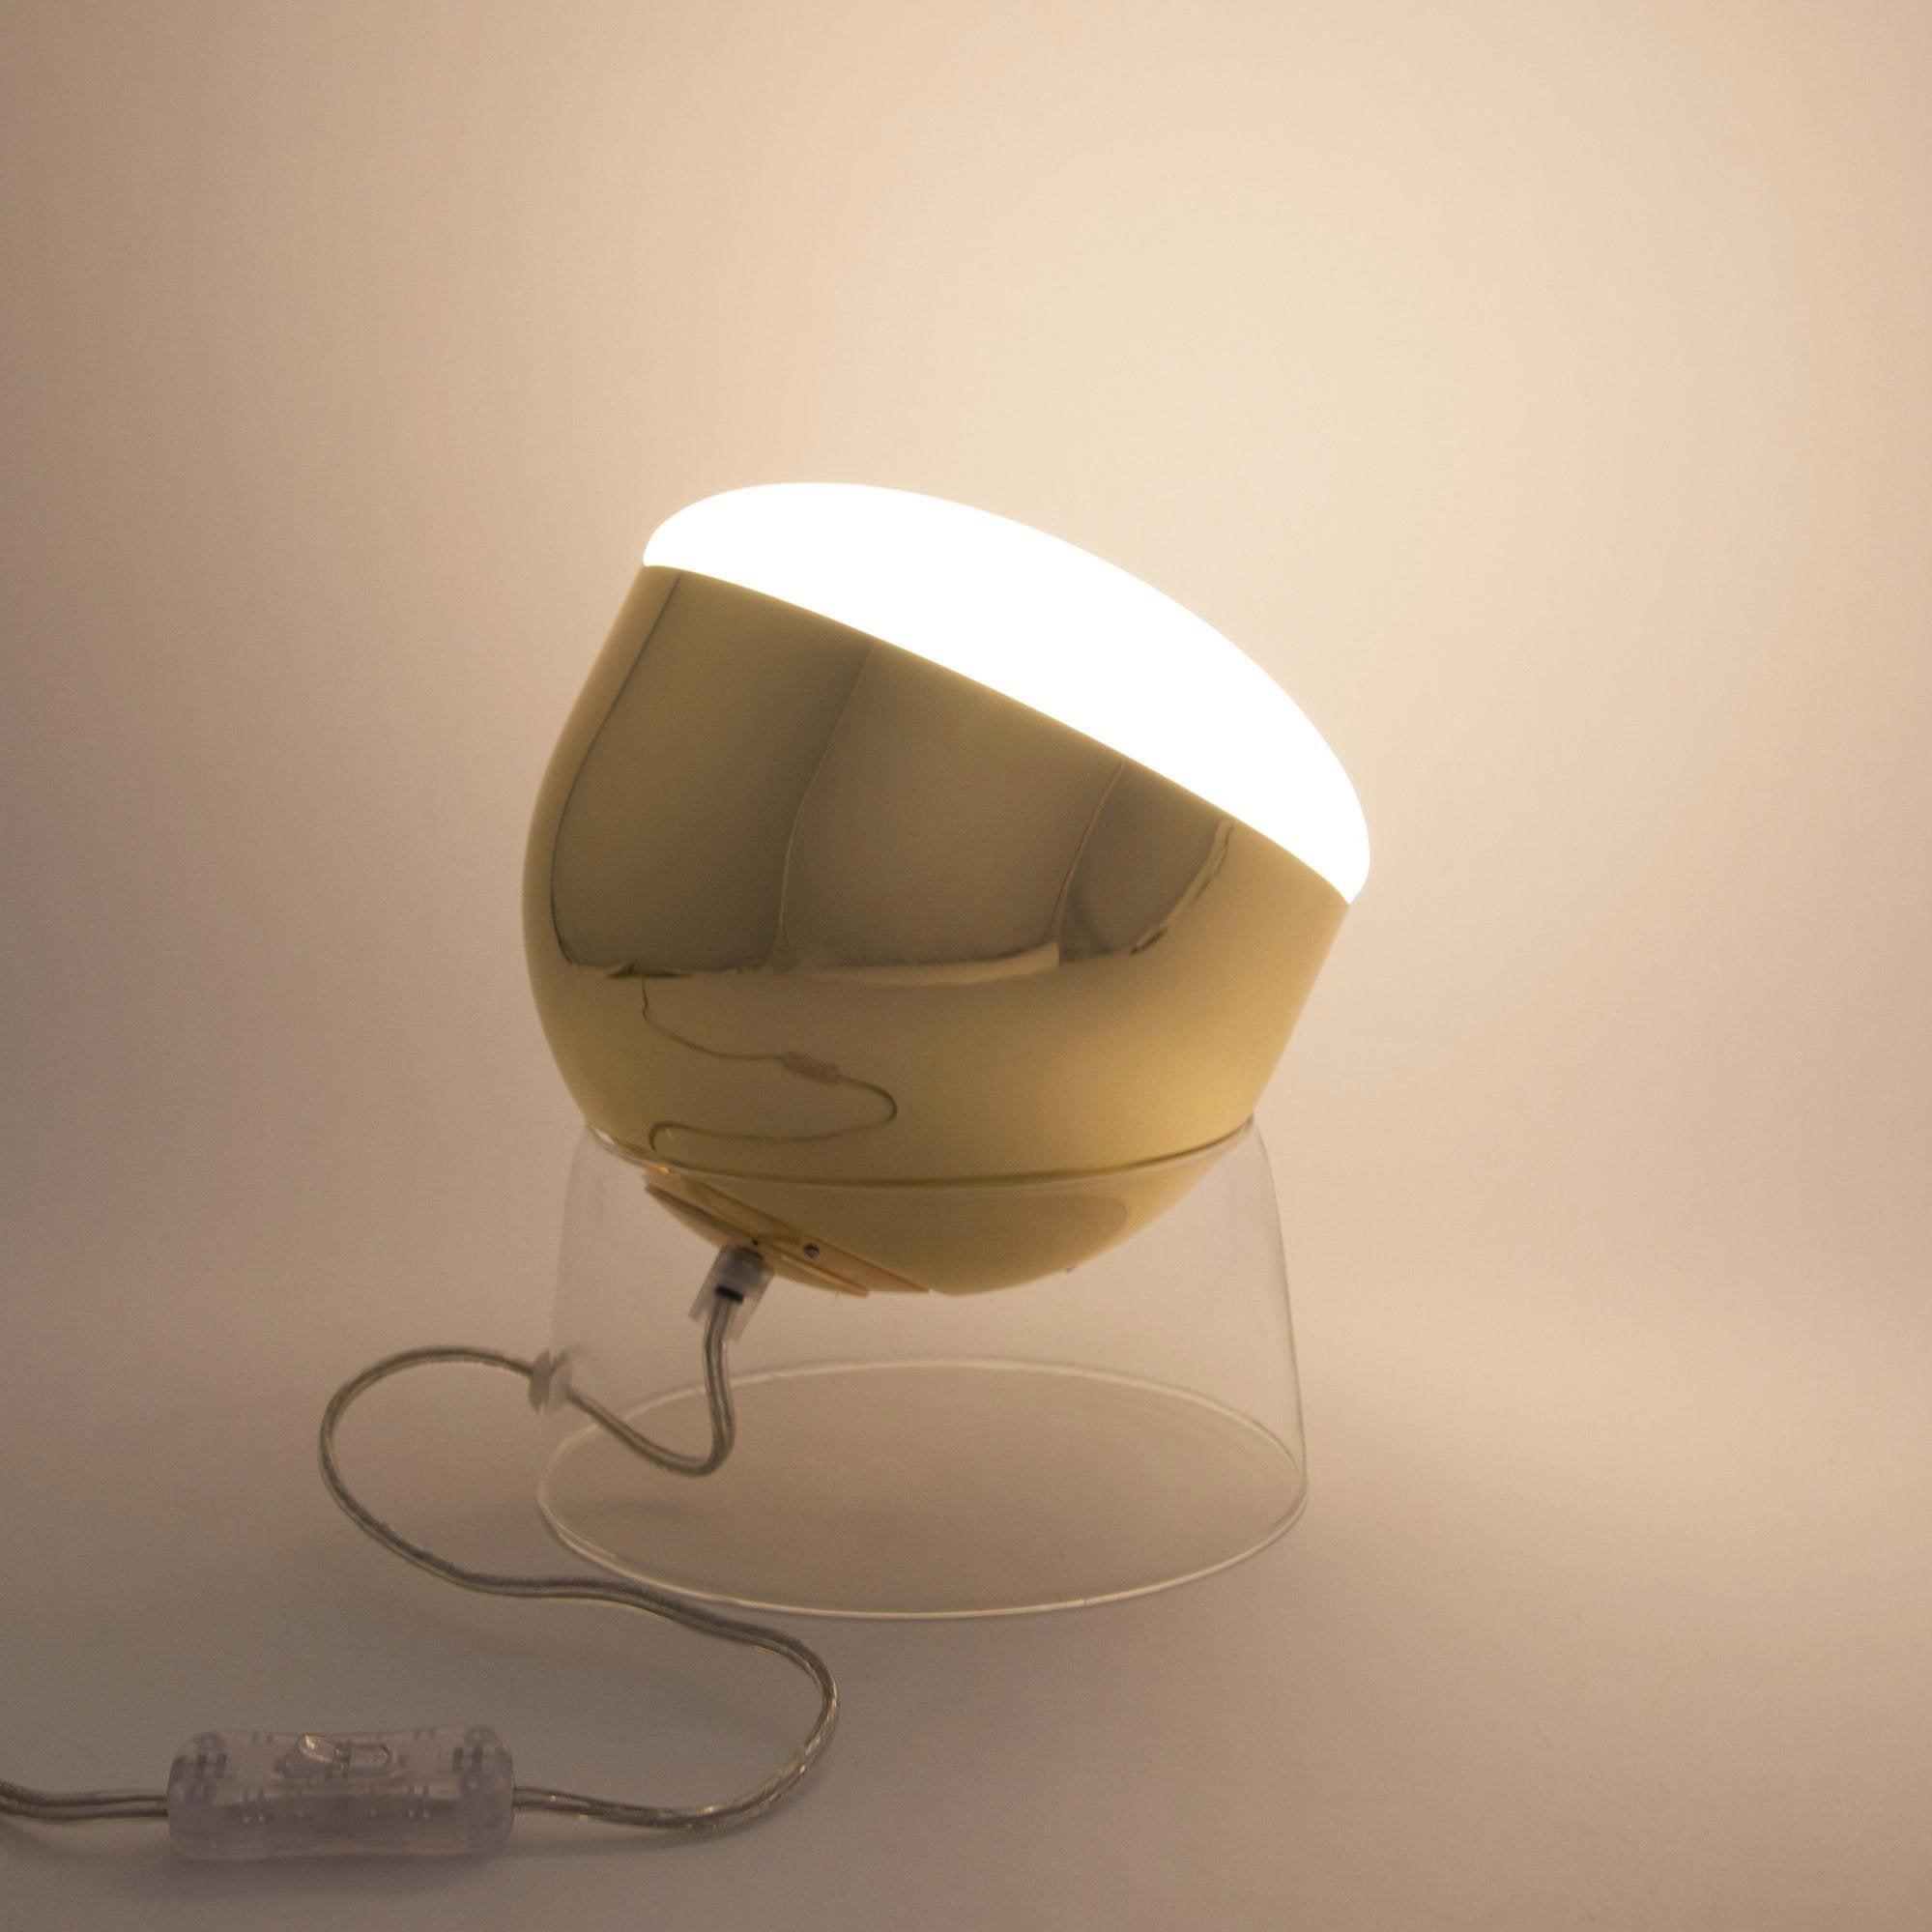 Lampe, design, métal laiton, LO EDITIONS Glossy